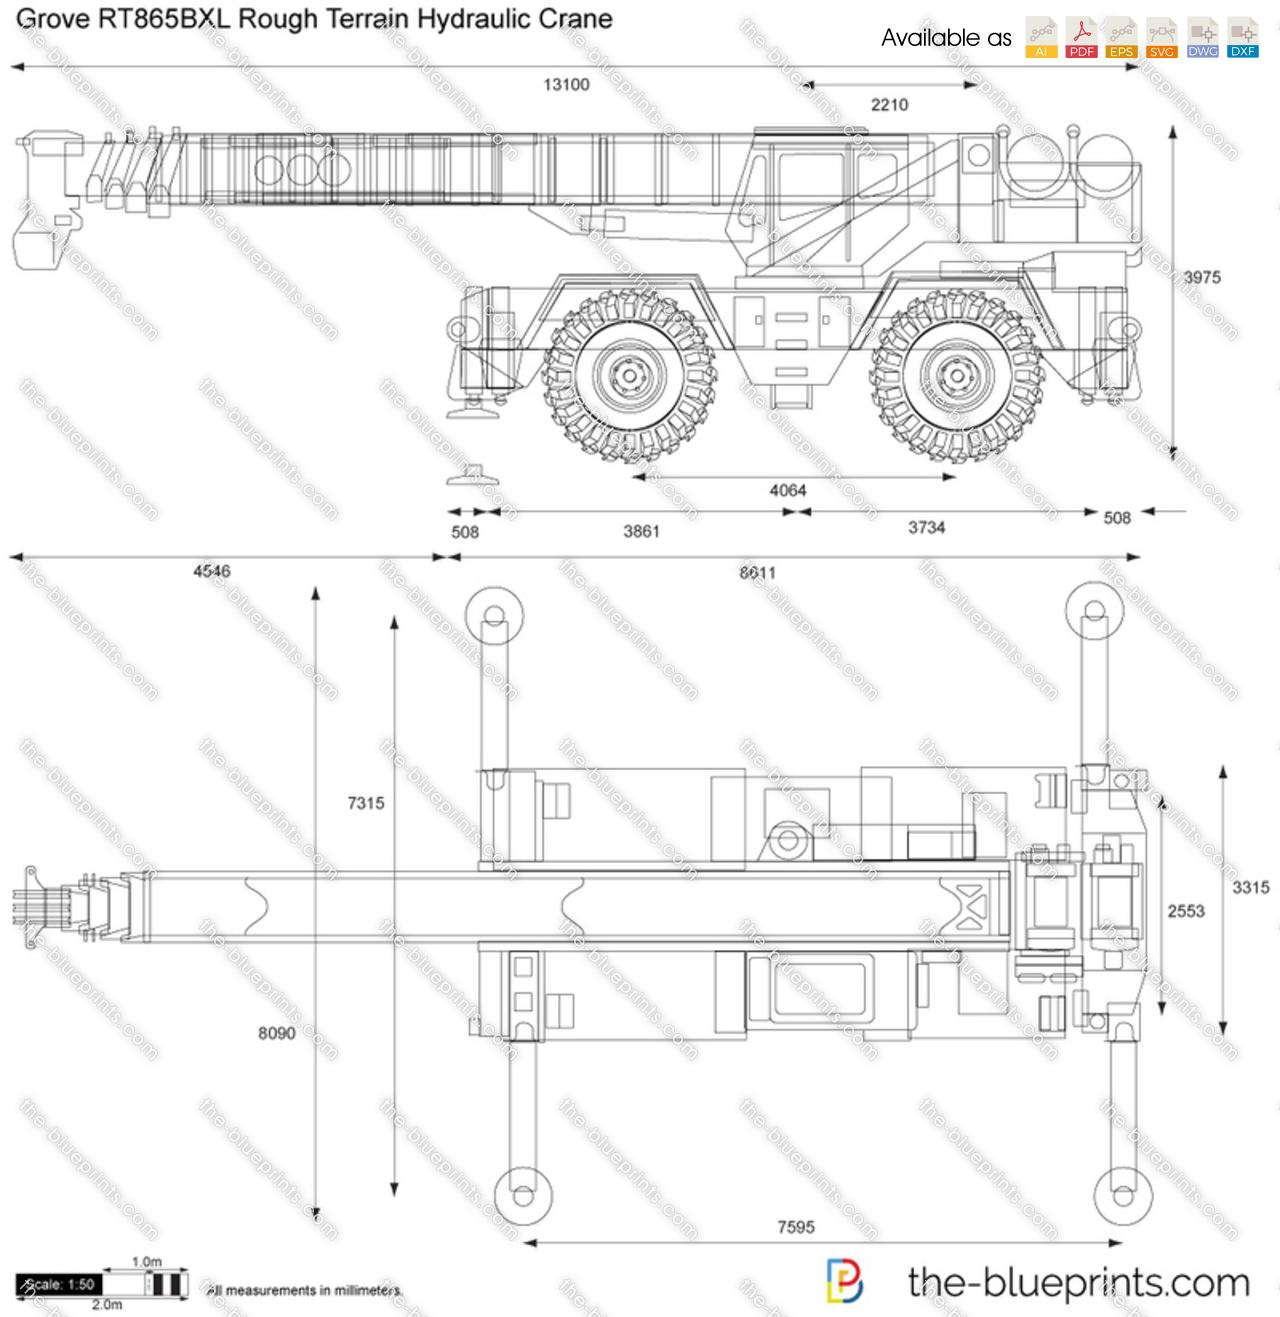 Grove RT865BXL Rough Terrain Hydraulic Crane